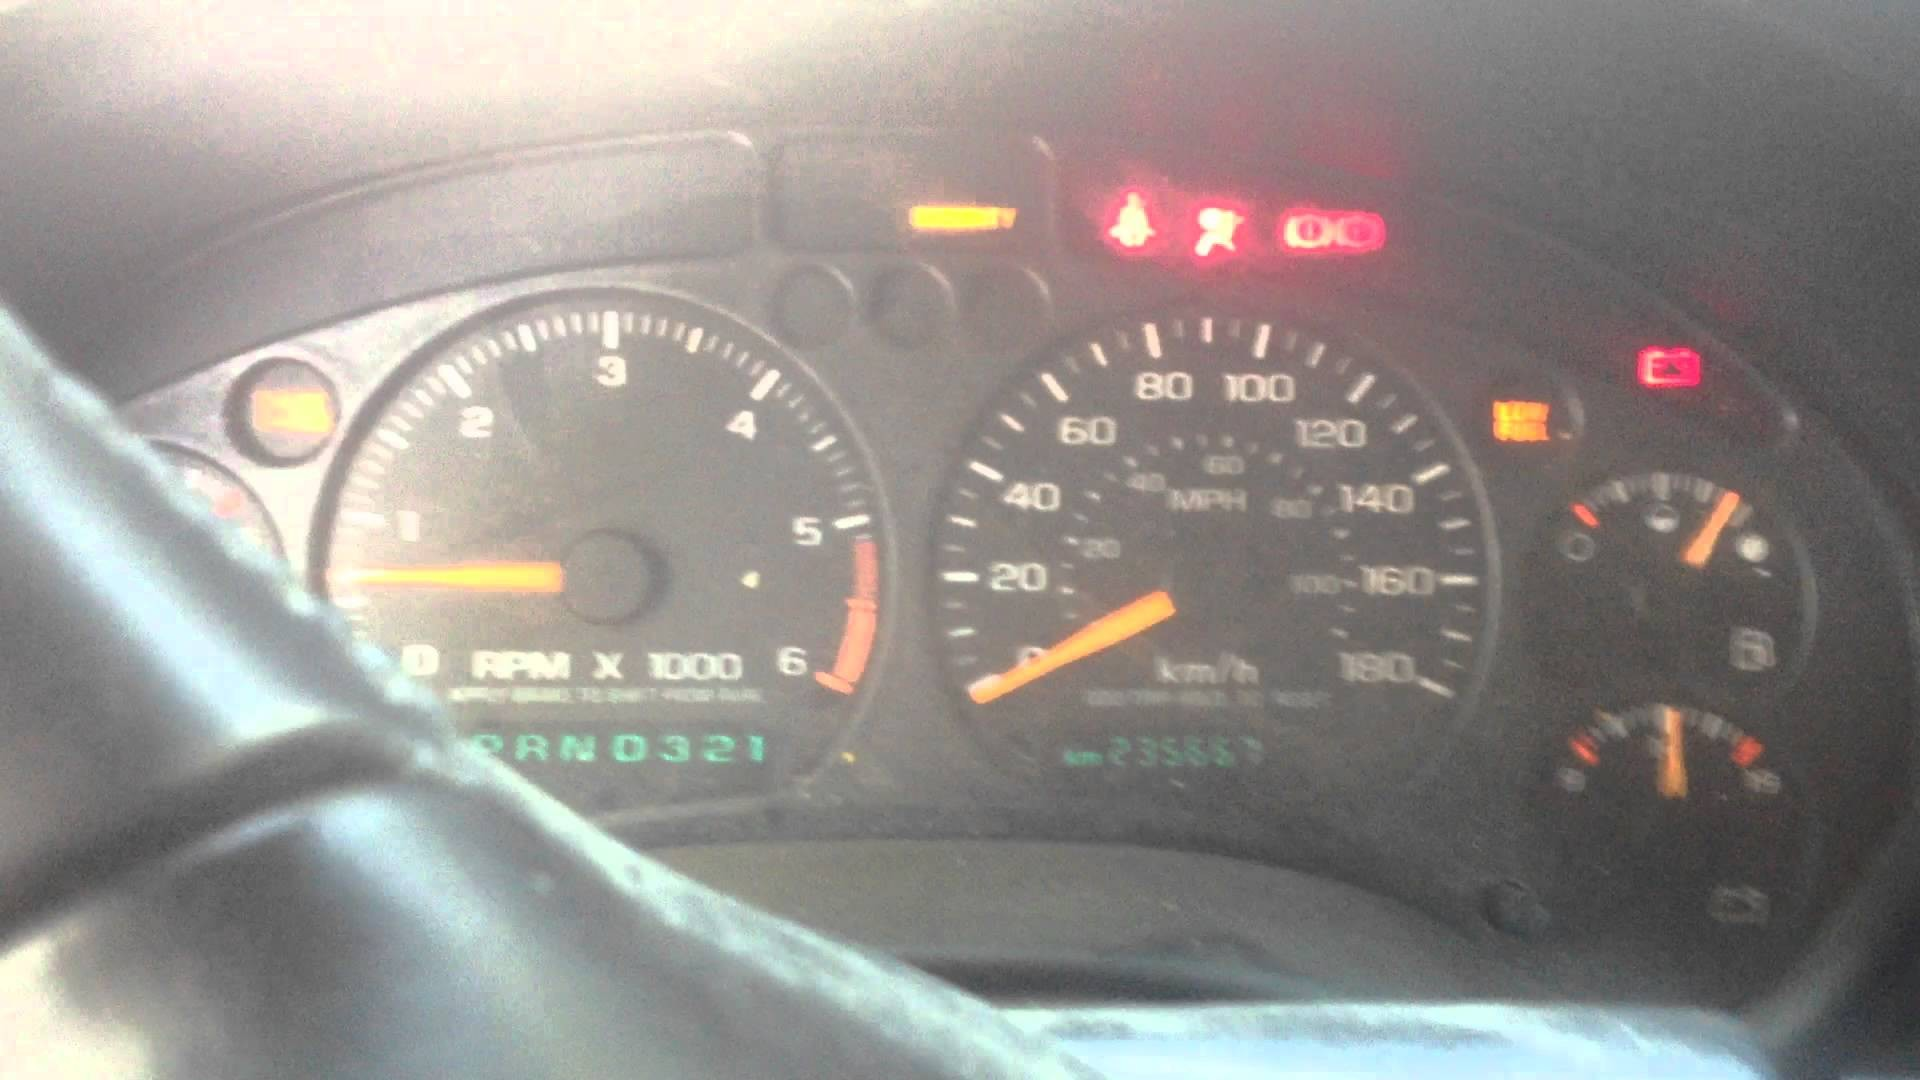 2001 Blazer Engine Diagram 2001 Chevy Blazer Misfire Hitting 1500 Rpm and Bogging It Self Of 2001 Blazer Engine Diagram